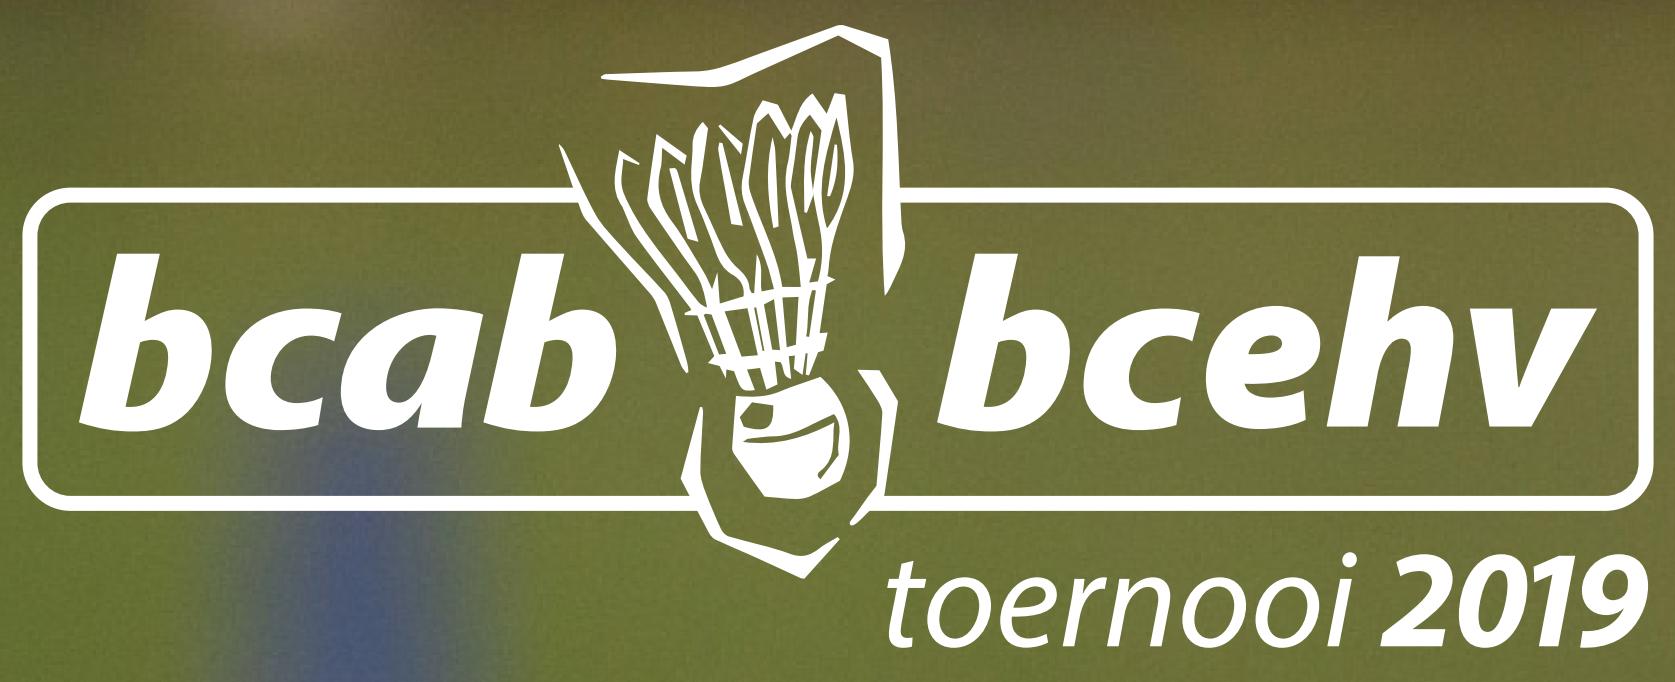 Uitnodiging BCAB/BCEHV toernooi 2019!